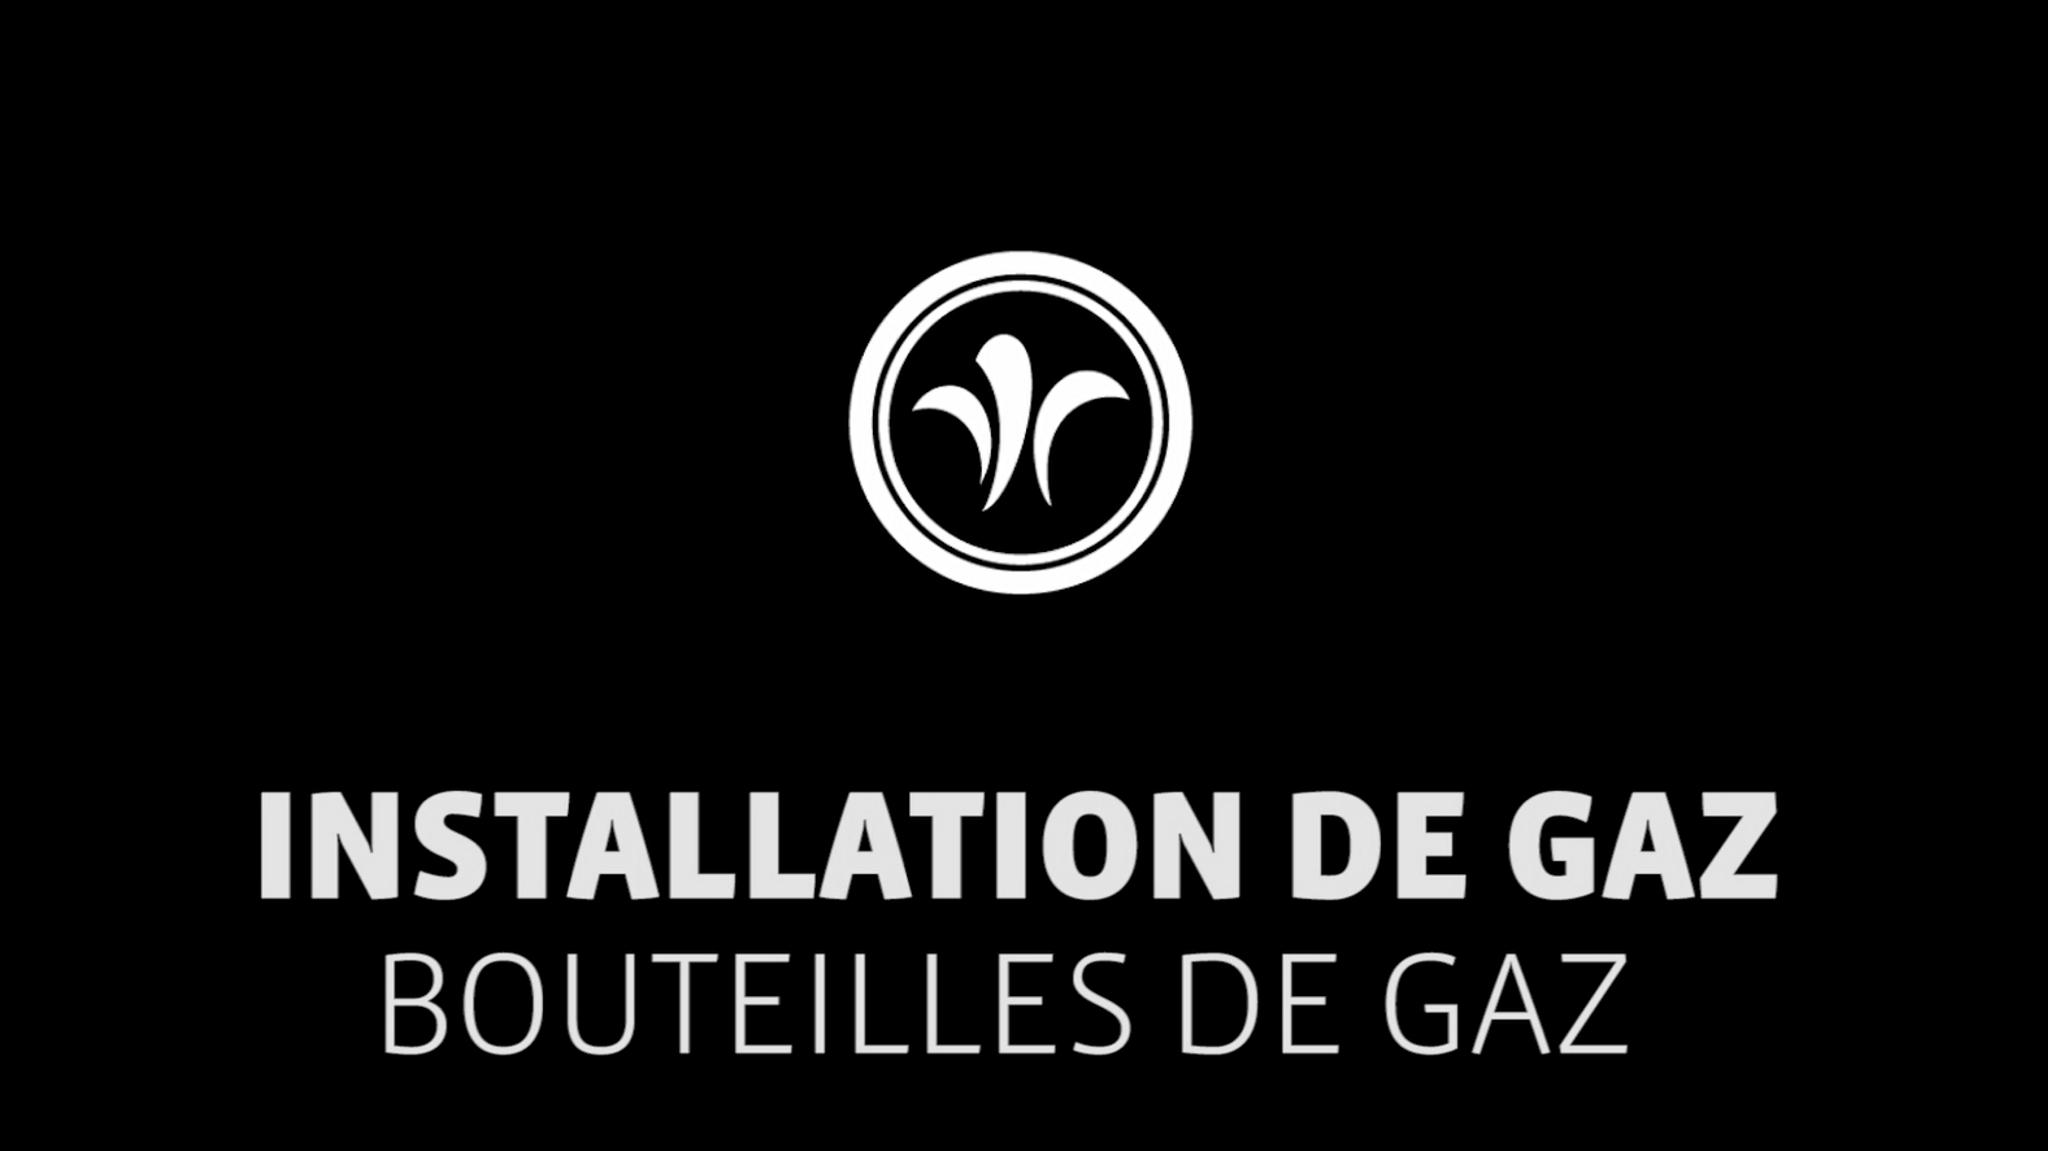 Bouteille de gaz pour camping-car // Niesmann+Bischoff - Camping-car de luxe (FLAIR) // 2019 // G1